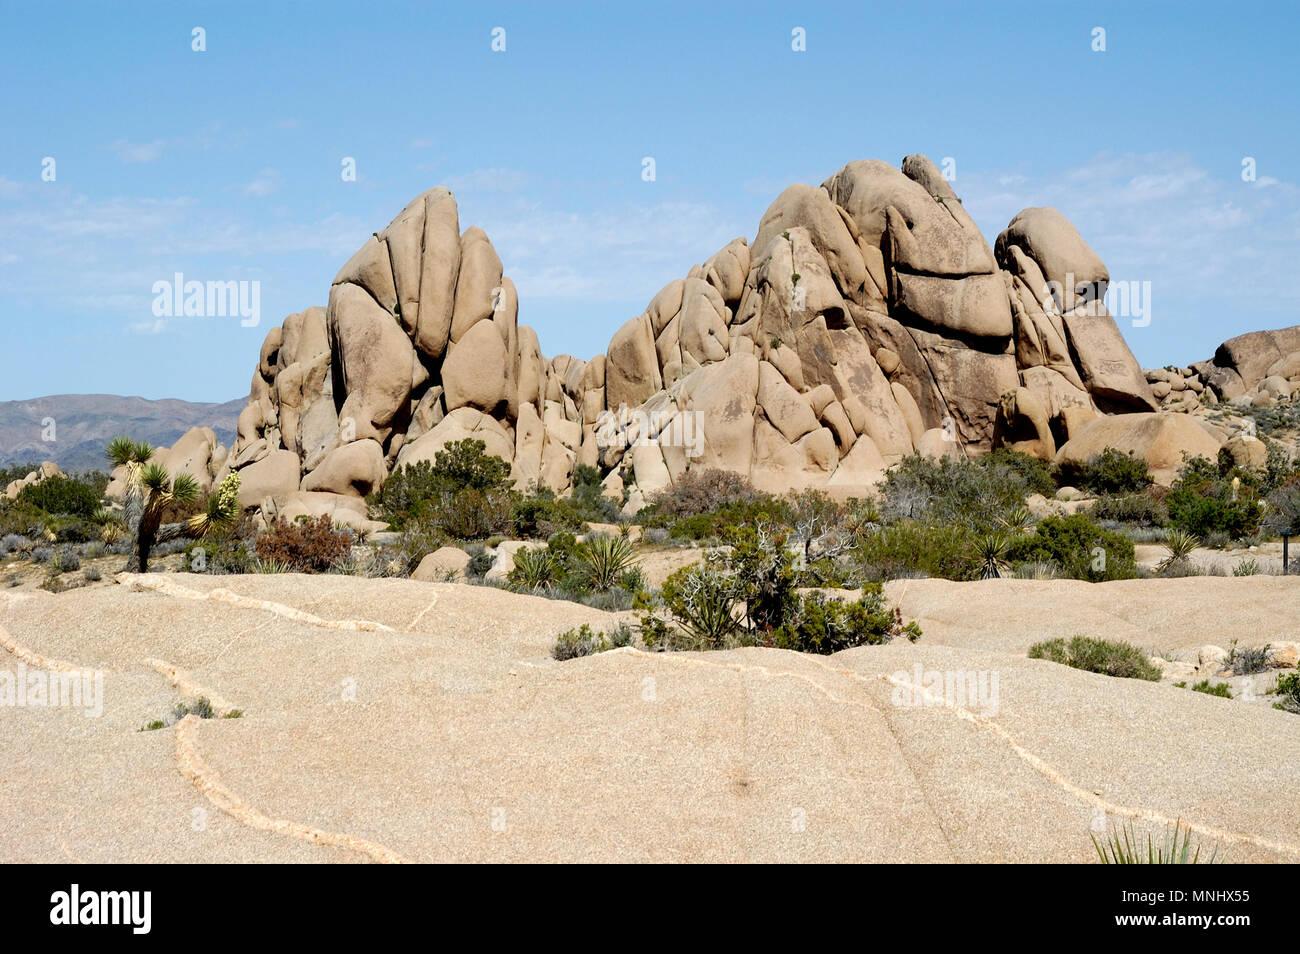 Monzogranite rock pile, Aplitic Veins, Jumbo Rocks, Joshua Tree National Park, CA 040410_0702 - Stock Image